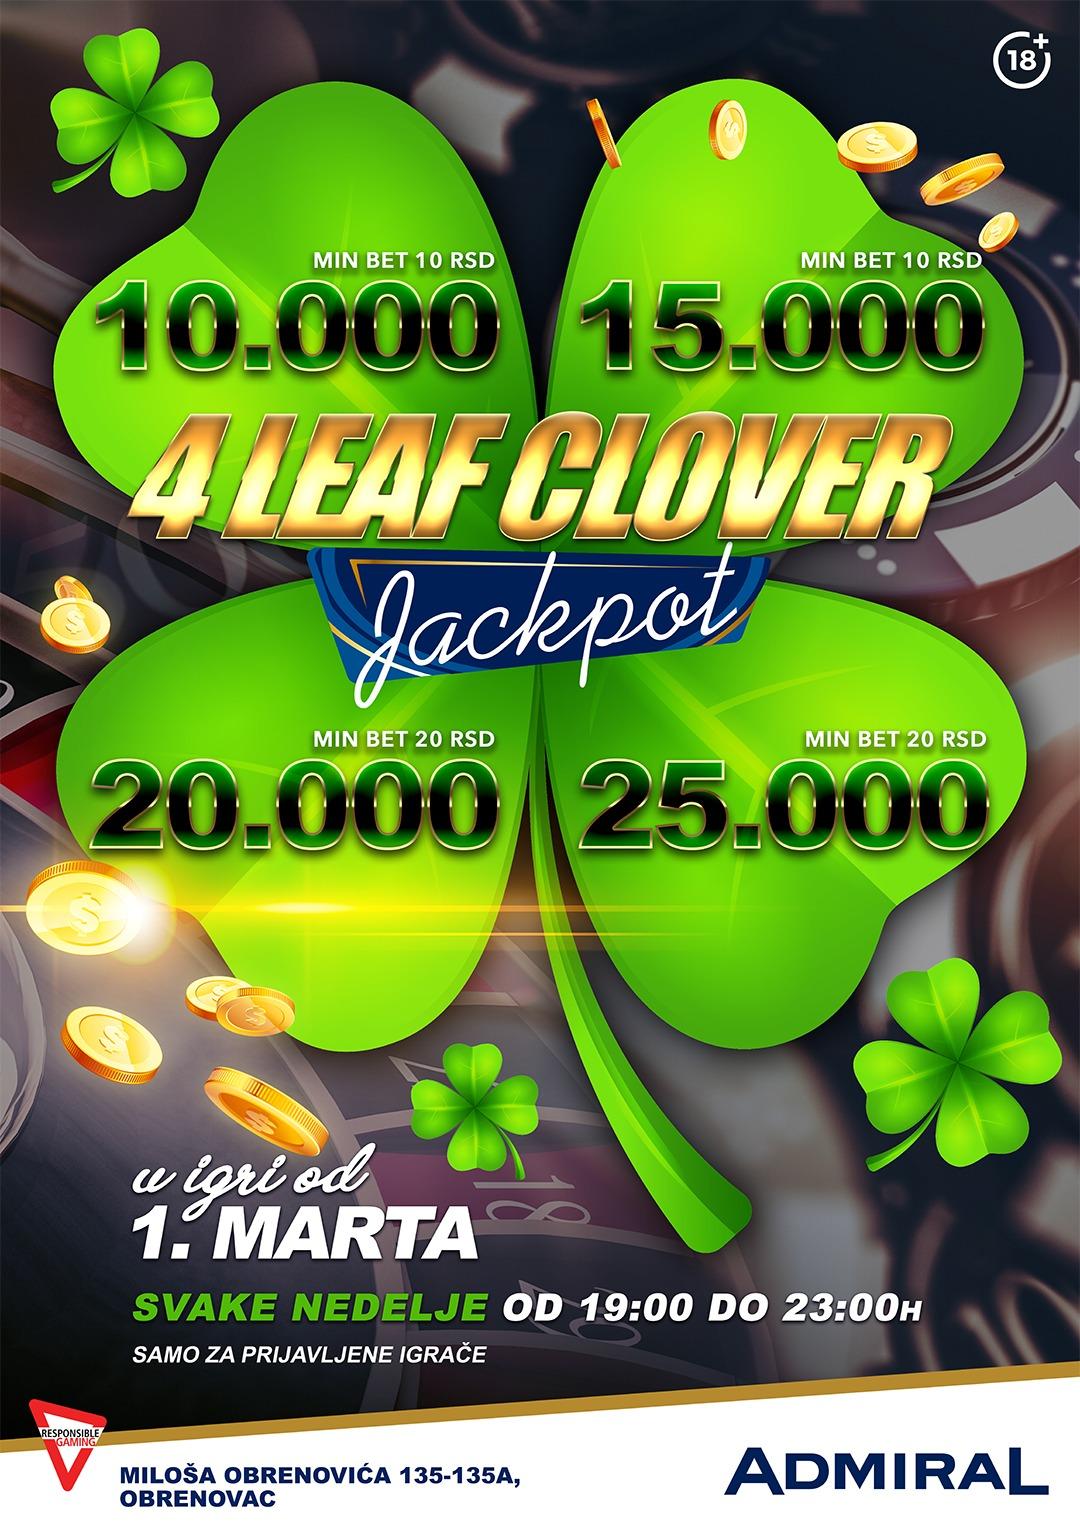 4 leaf clover – obrenovac